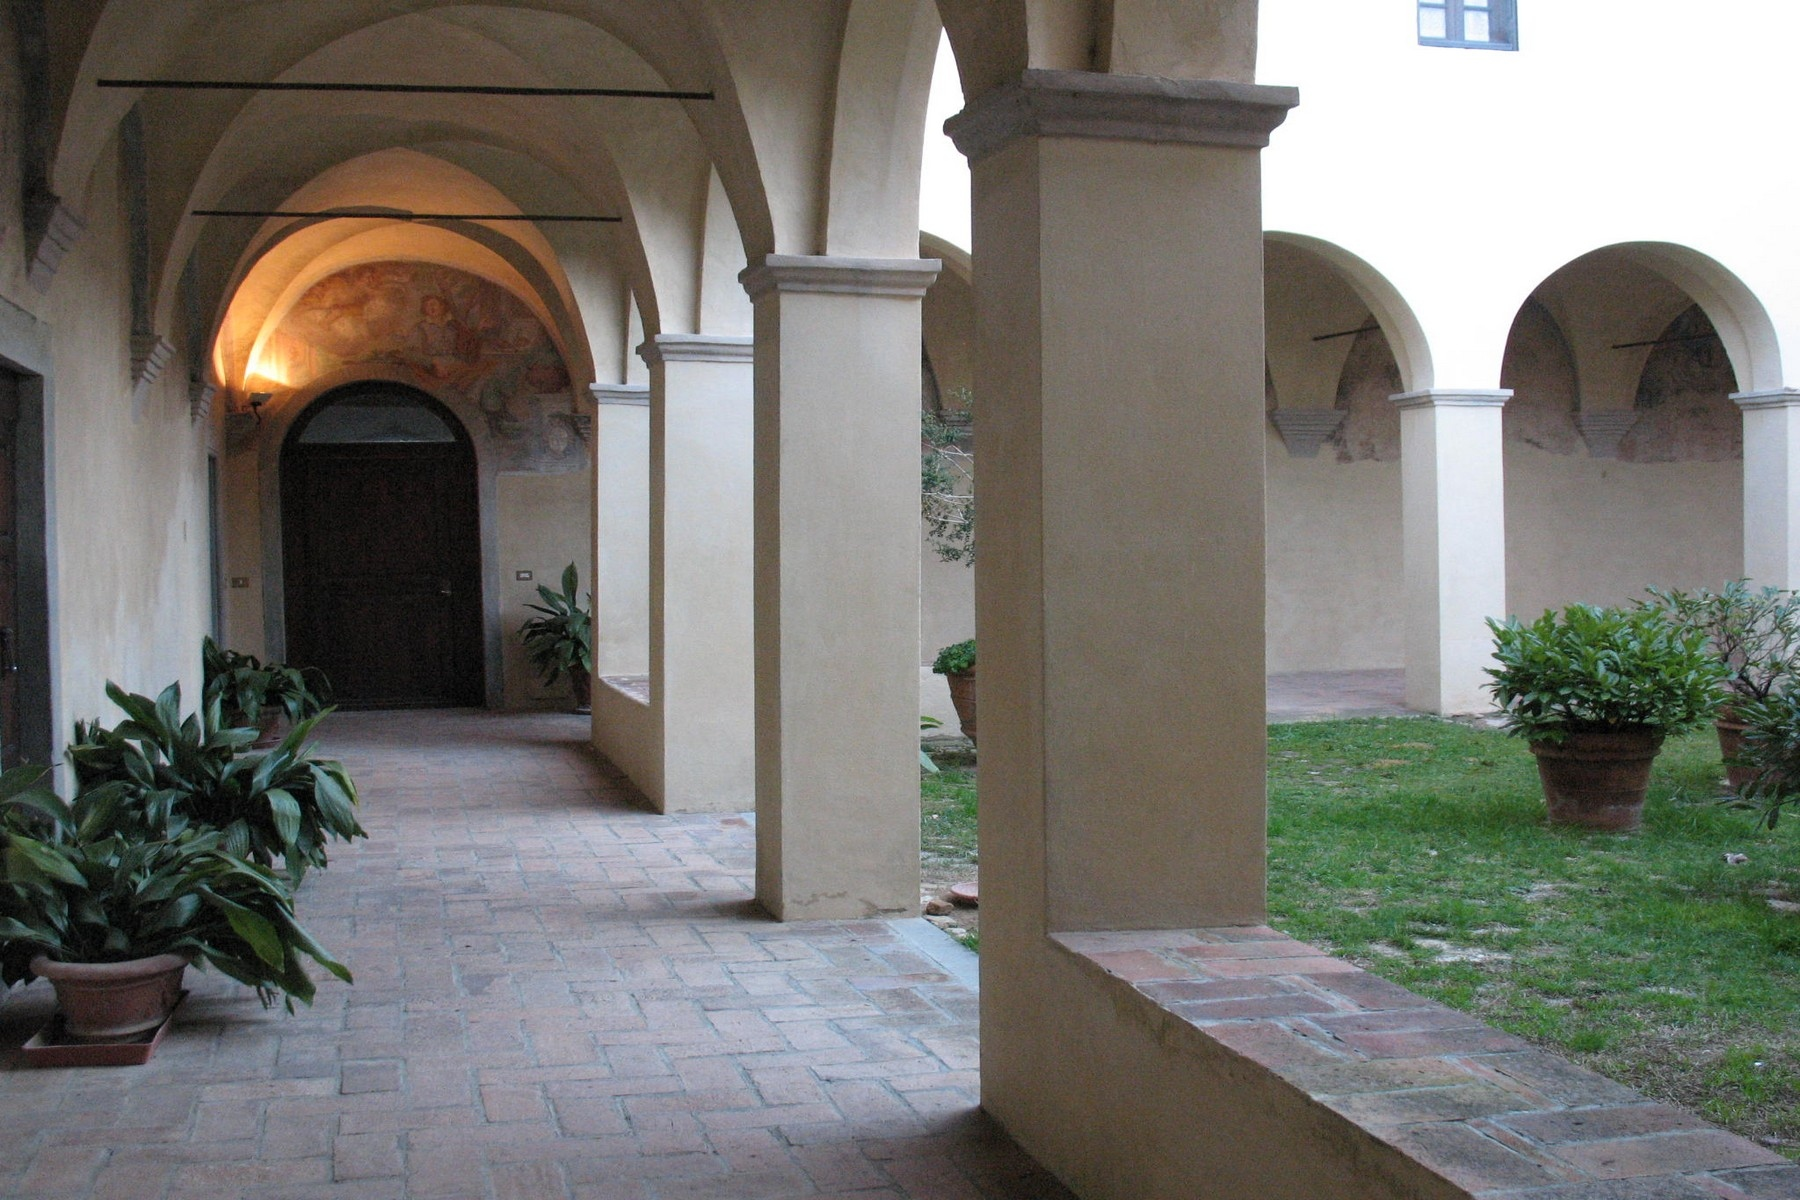 Appartamento in Vendita a San Casciano In Val Di Pesa: 4 locali, 85 mq - Foto 9